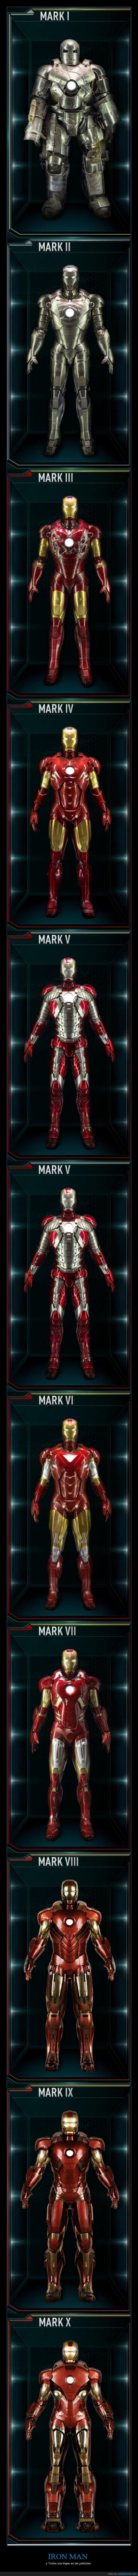 armadura,heroe,Iron Man,Mark,películas,tony stark,trajes